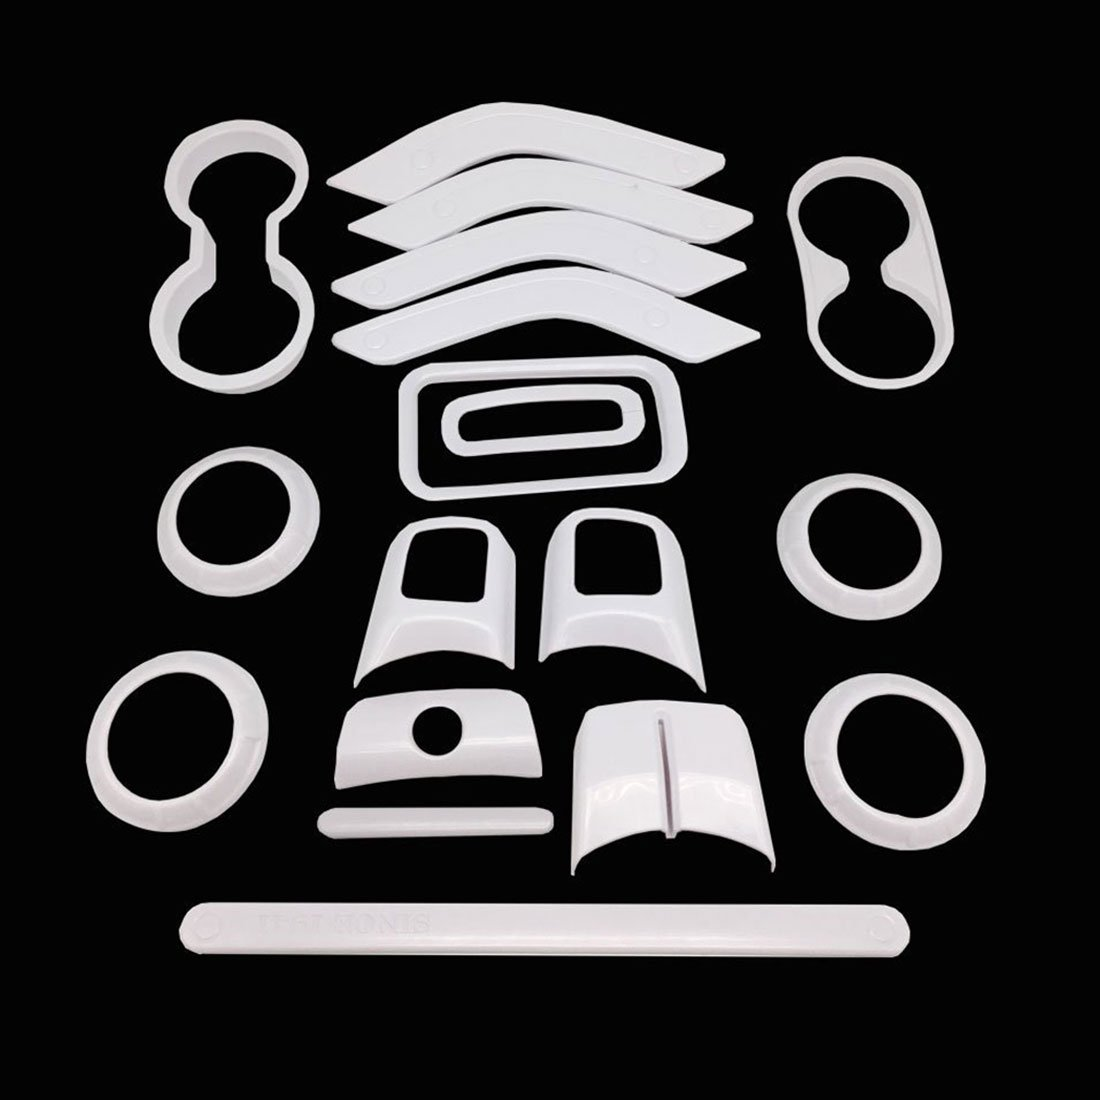 E-cowlboy 18 PCS Full Set Interior Decoration Trim Kit,Interior Door Handle Cover Trim,Air Conditioning Vent Cover Trim Silver Copilot Handle Cover Trim,for Jeep Wrangler JK JKU 2011-2018 4-Door